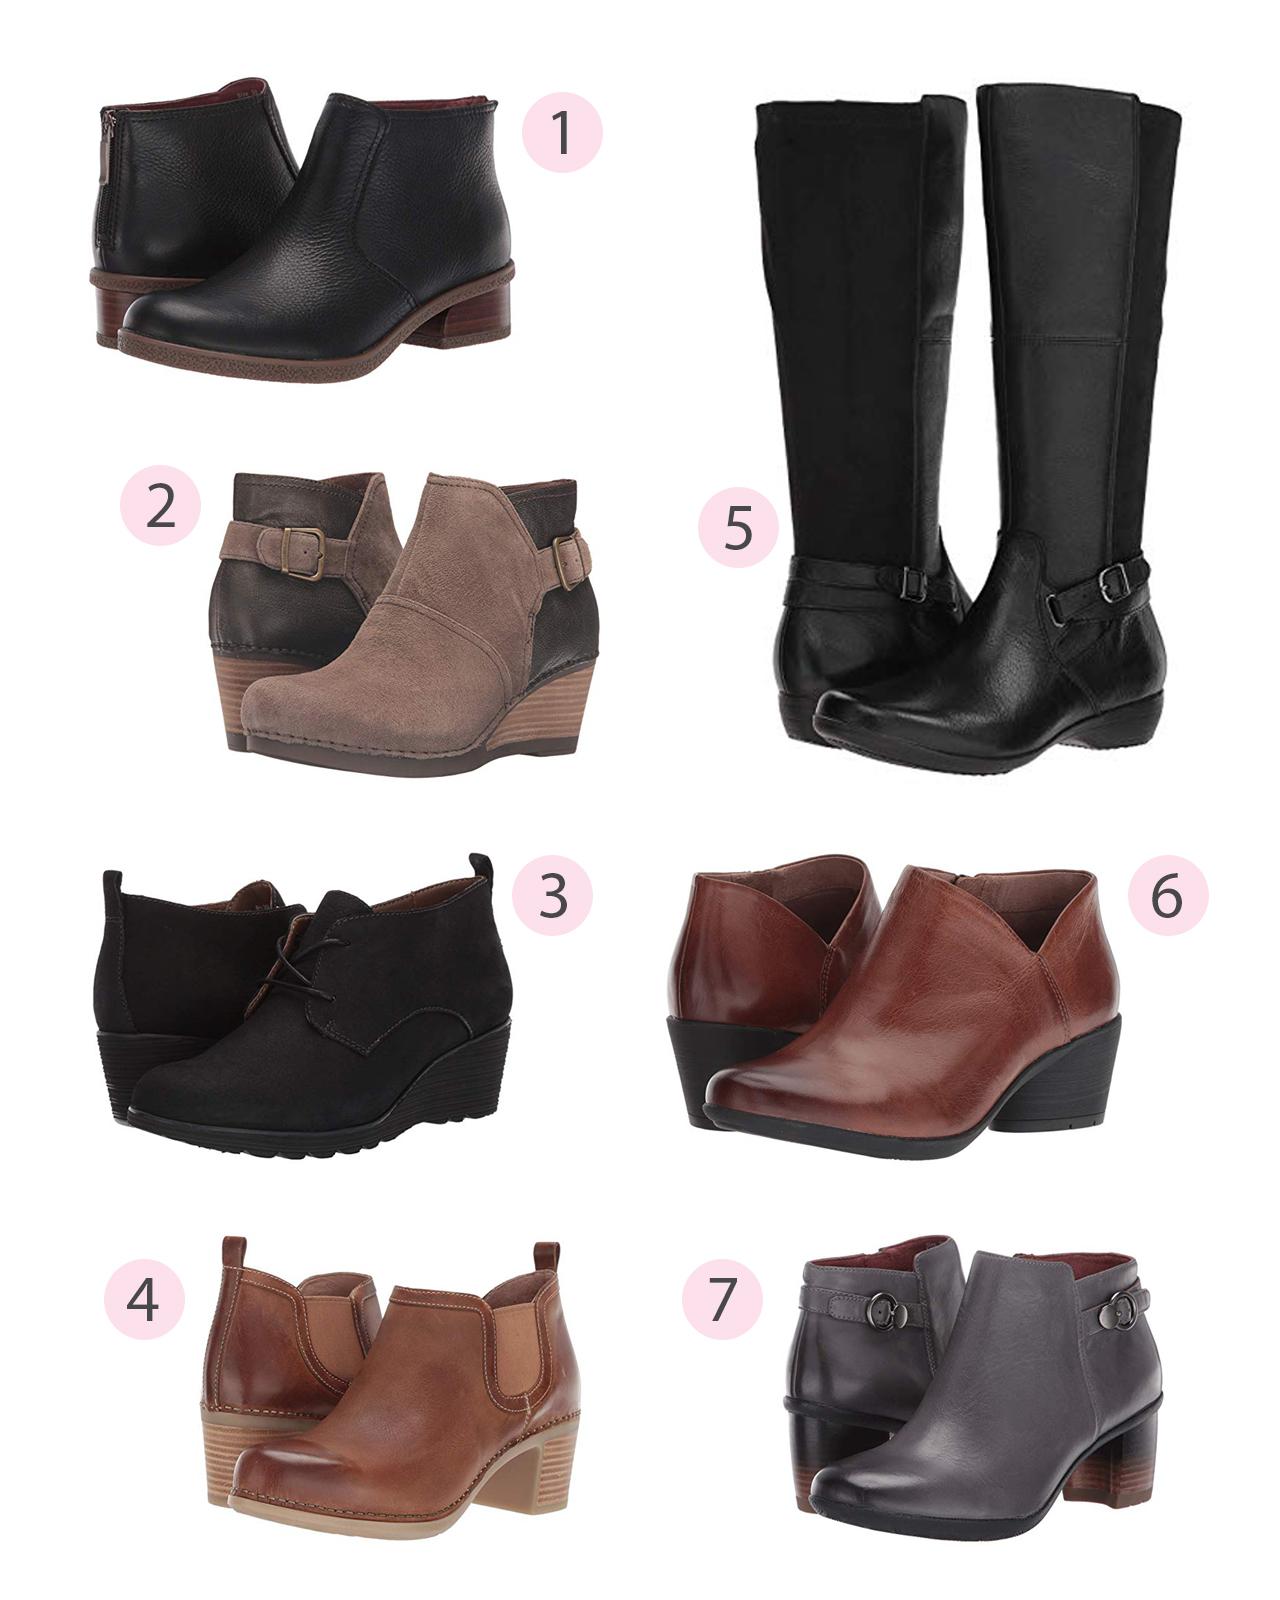 Zappos Dansko Shoes